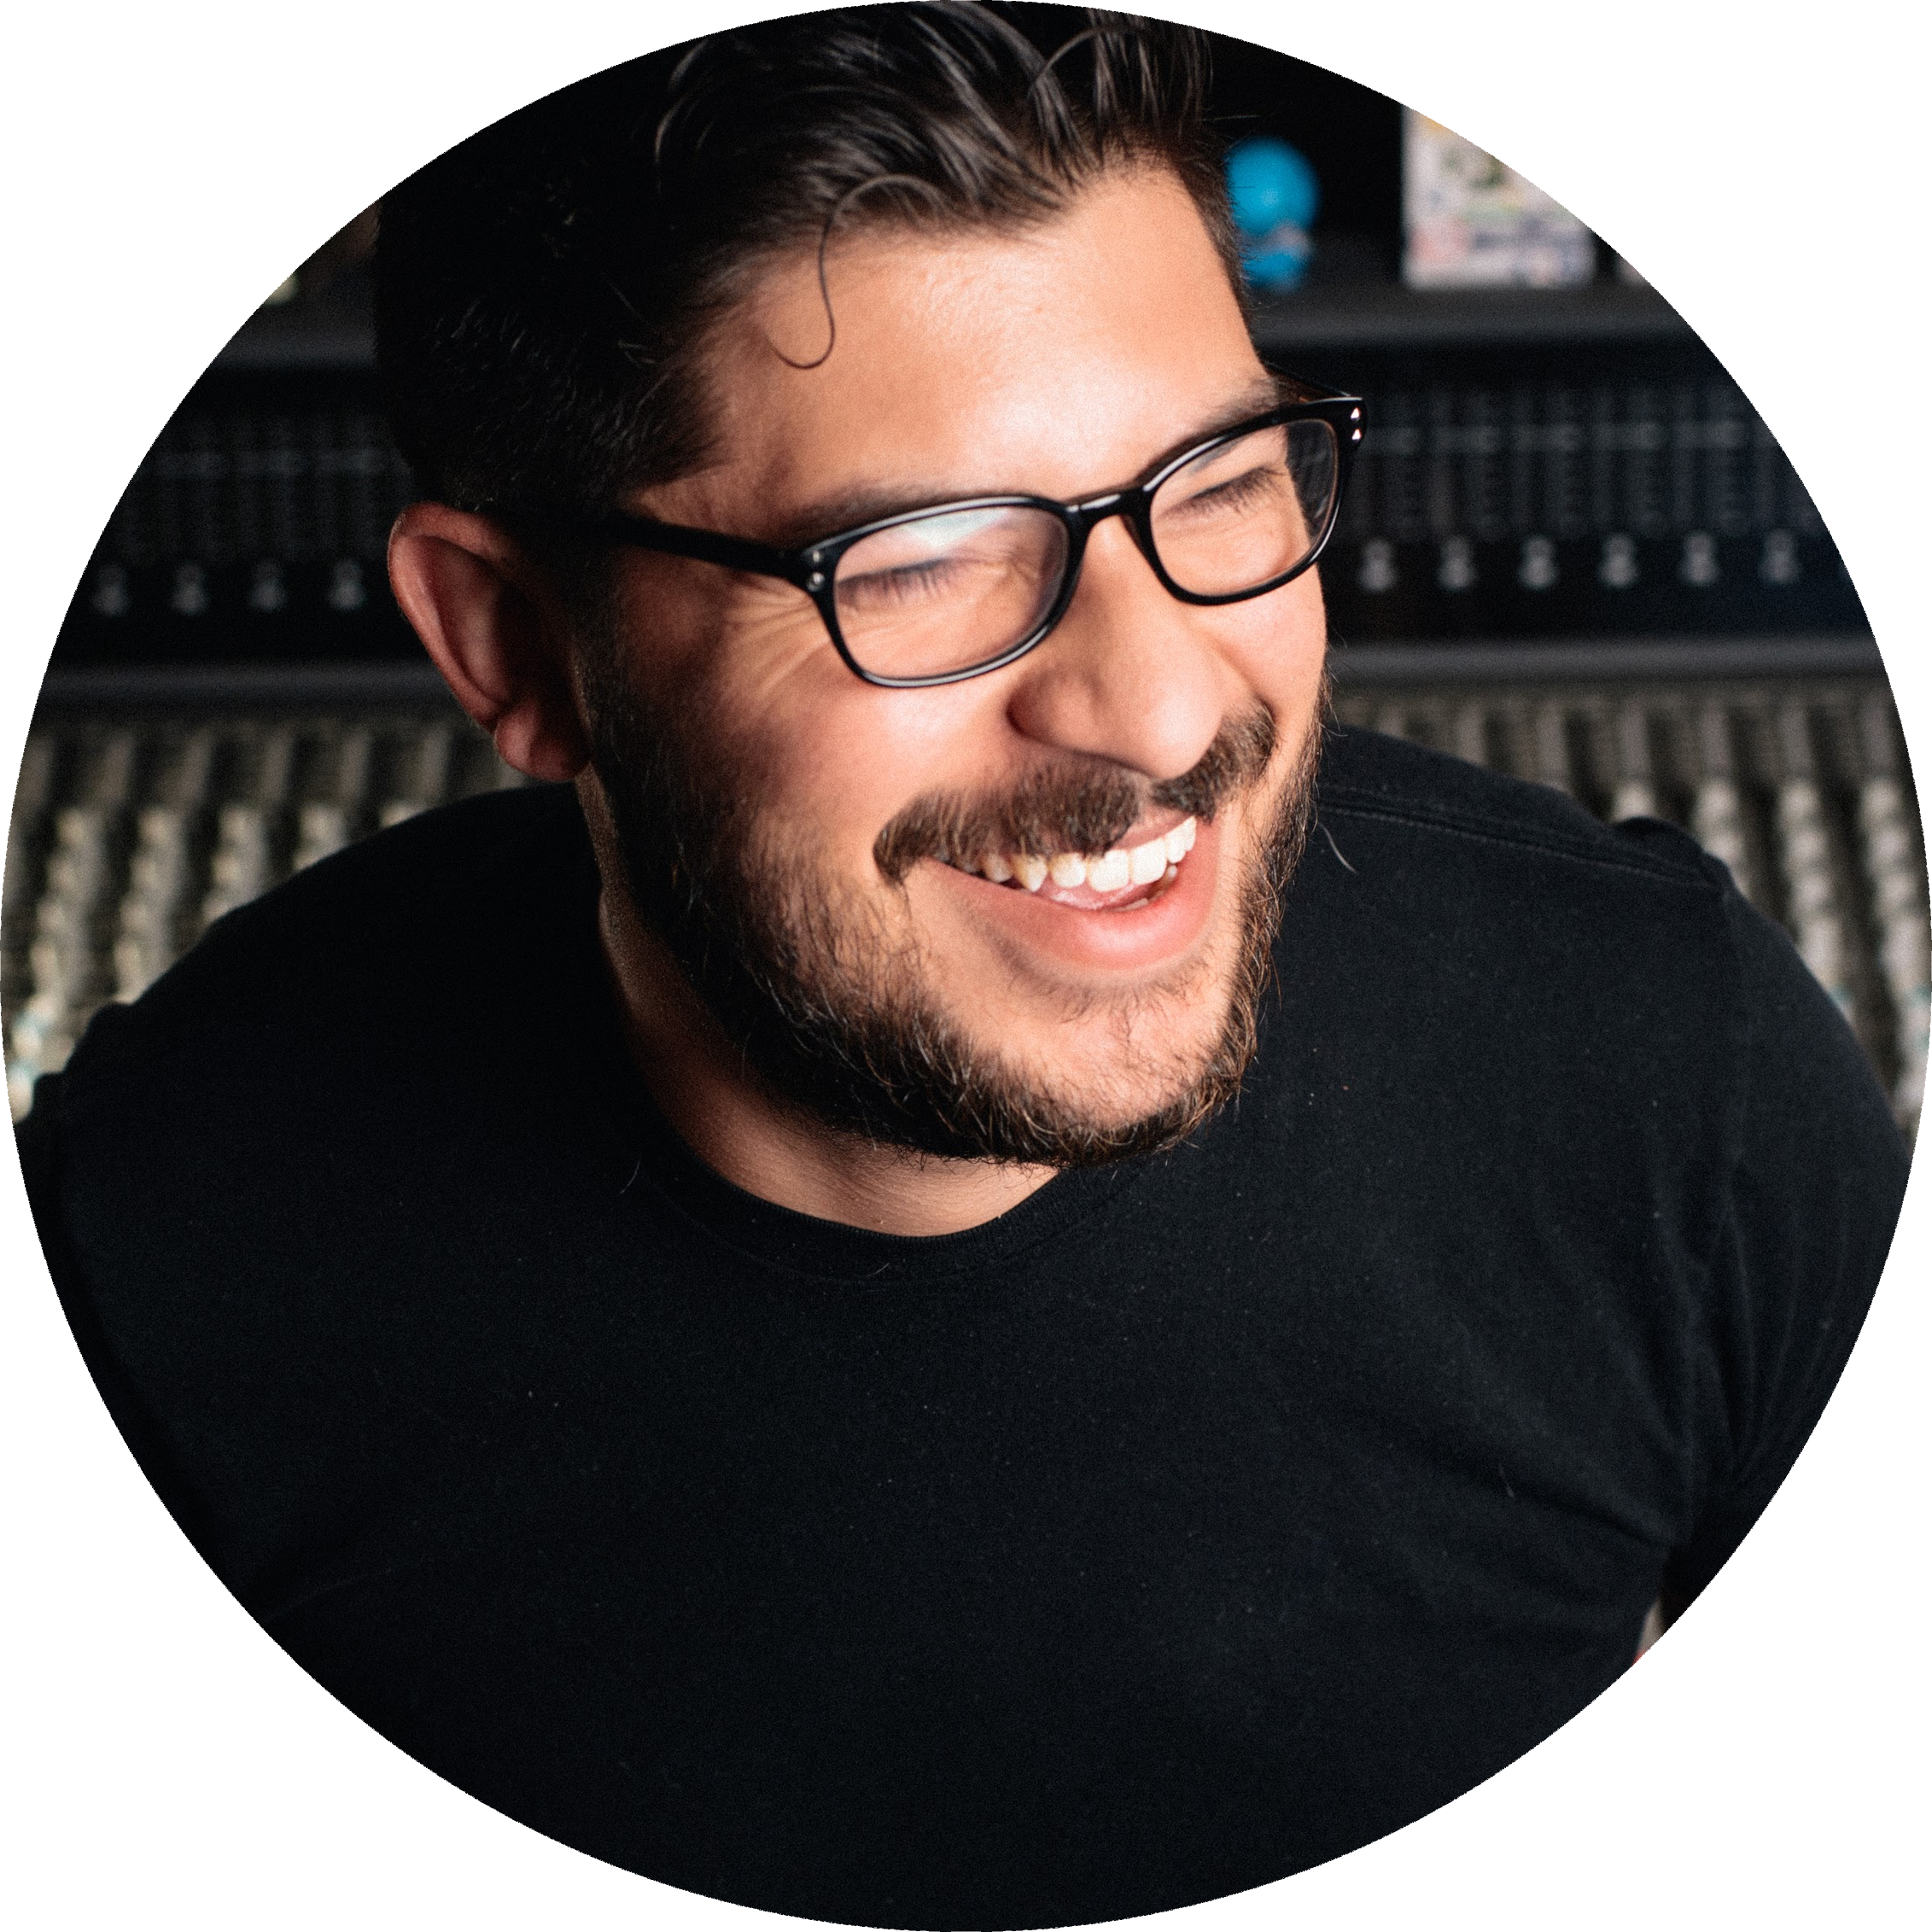 @Charlievela Profile Image | Linktree